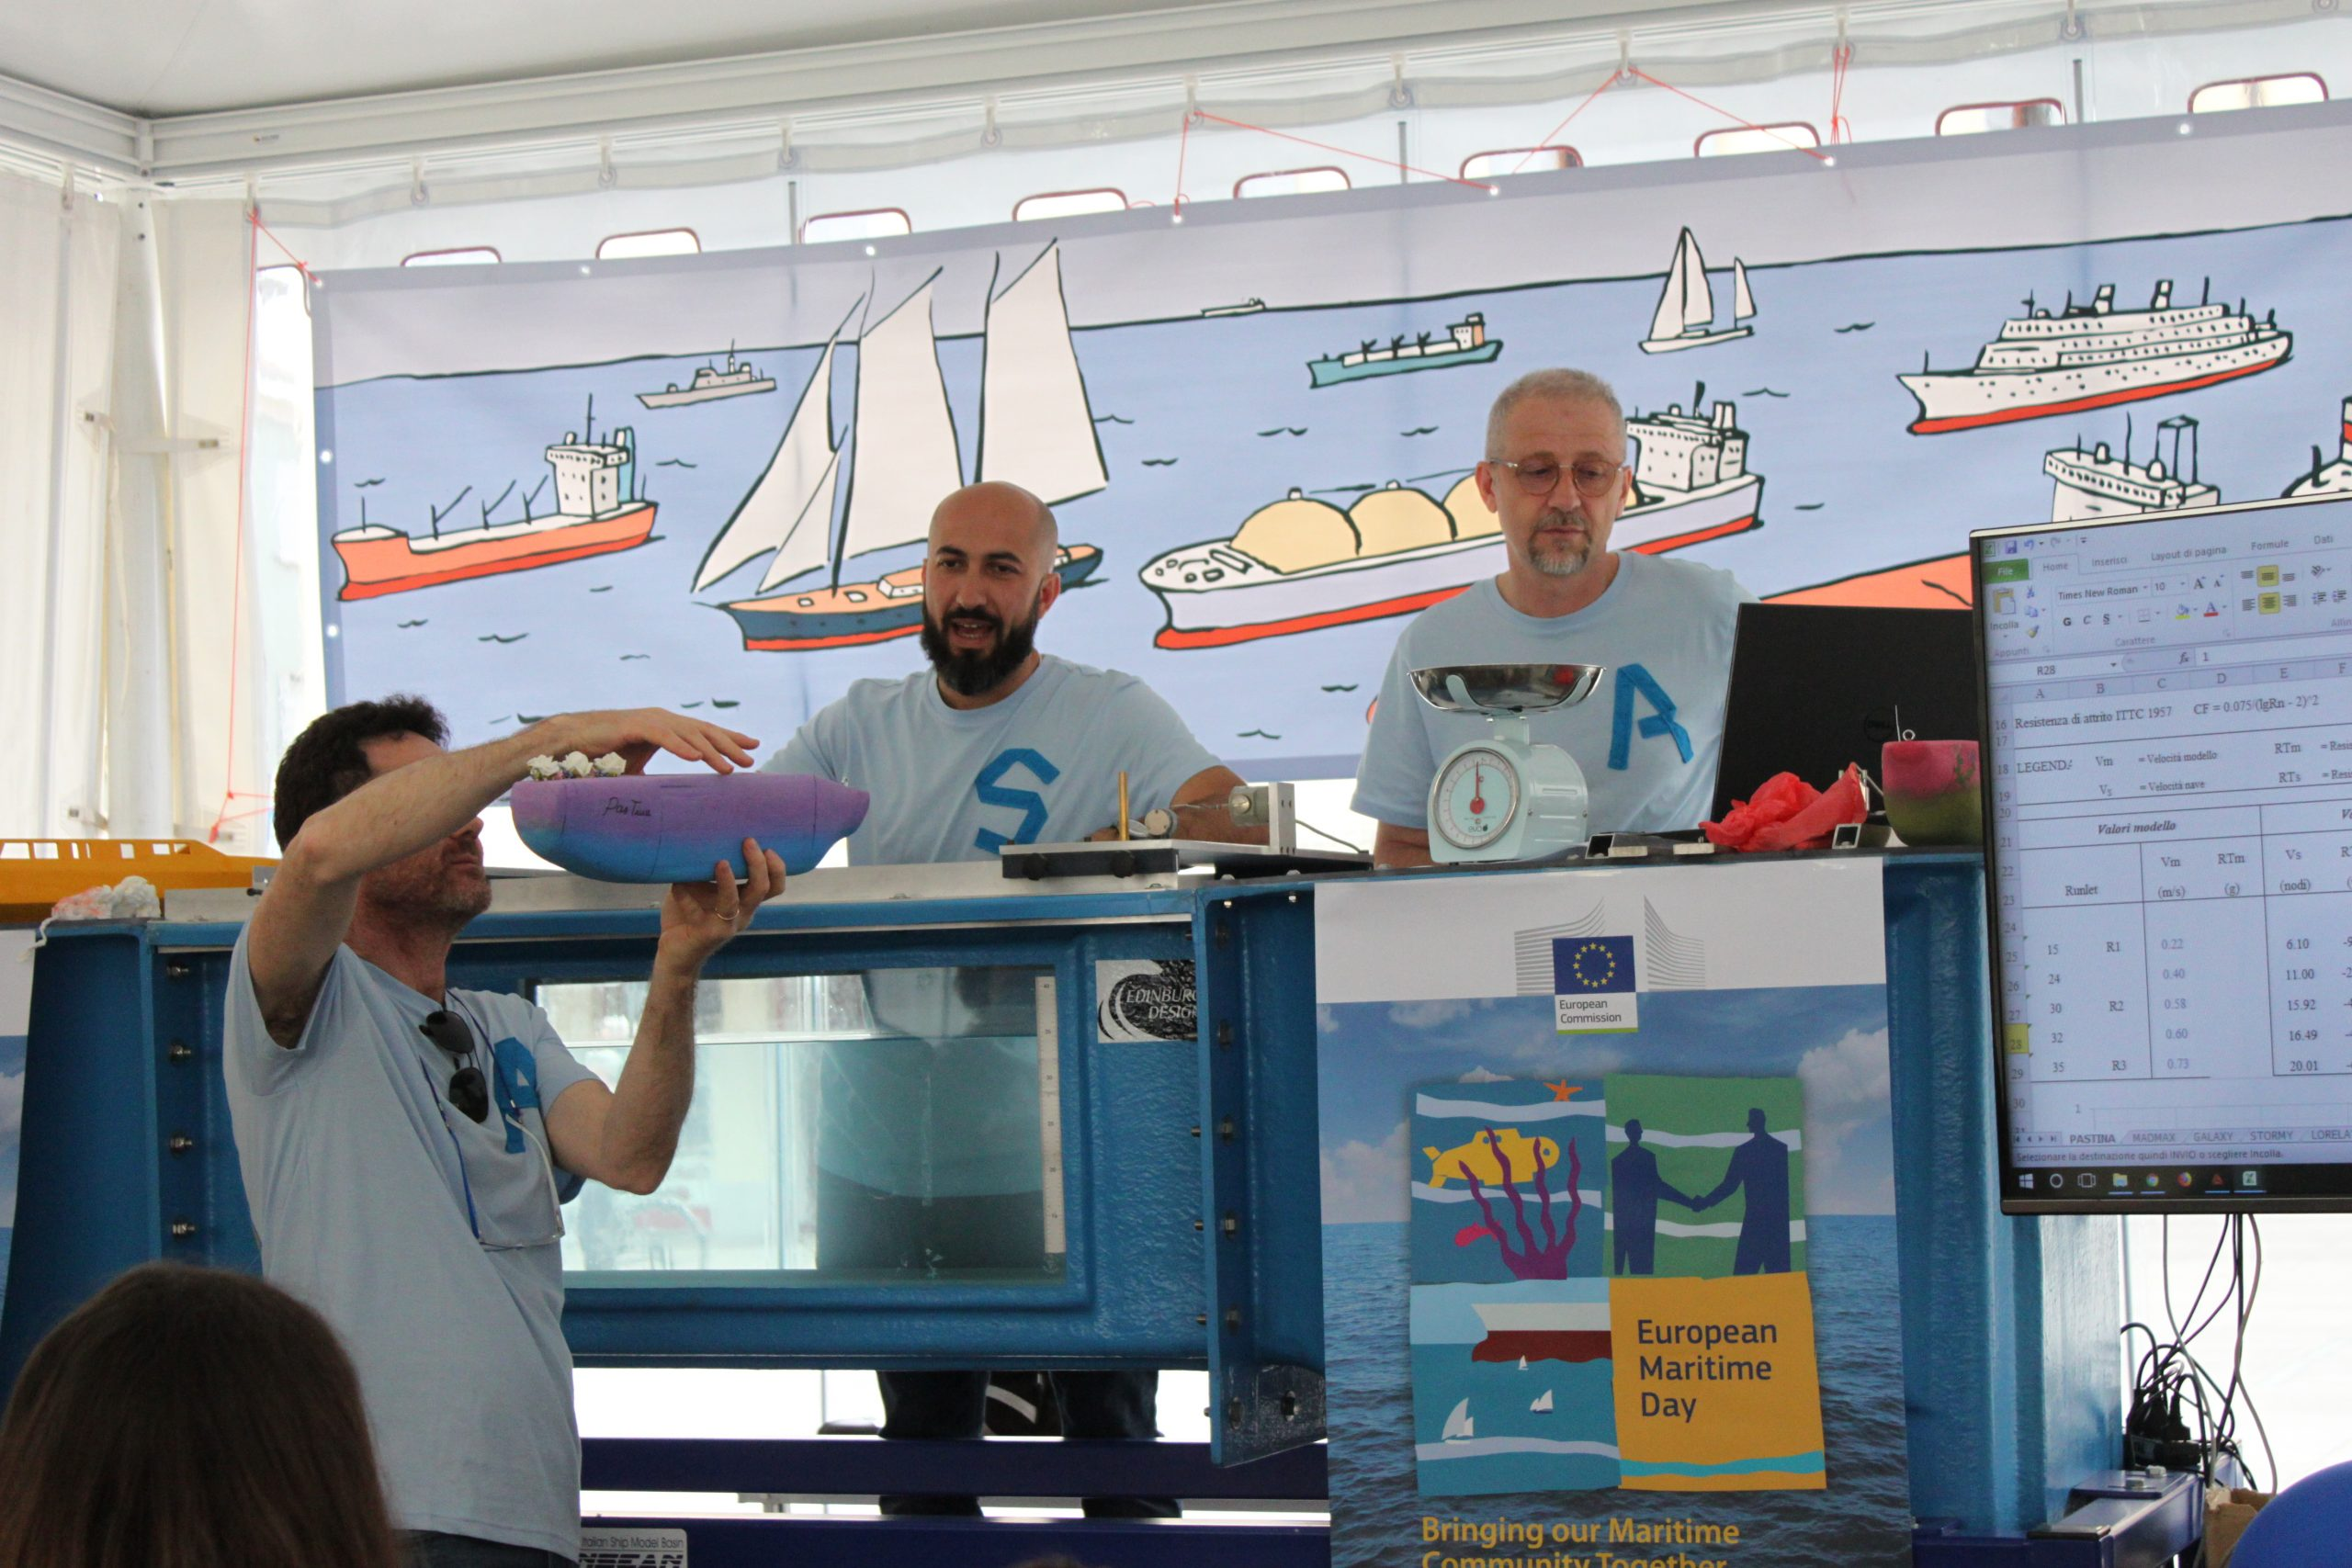 European Maritime Day 2018